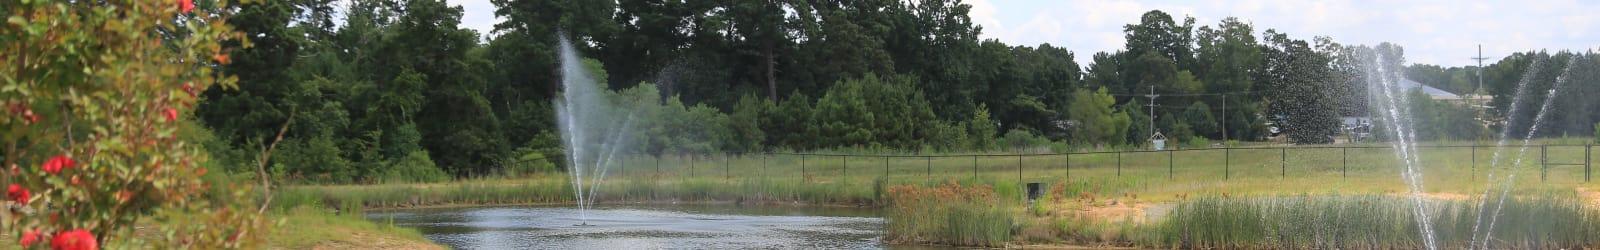 Neighborhood near Belforest Villas in Daphne, Alabama